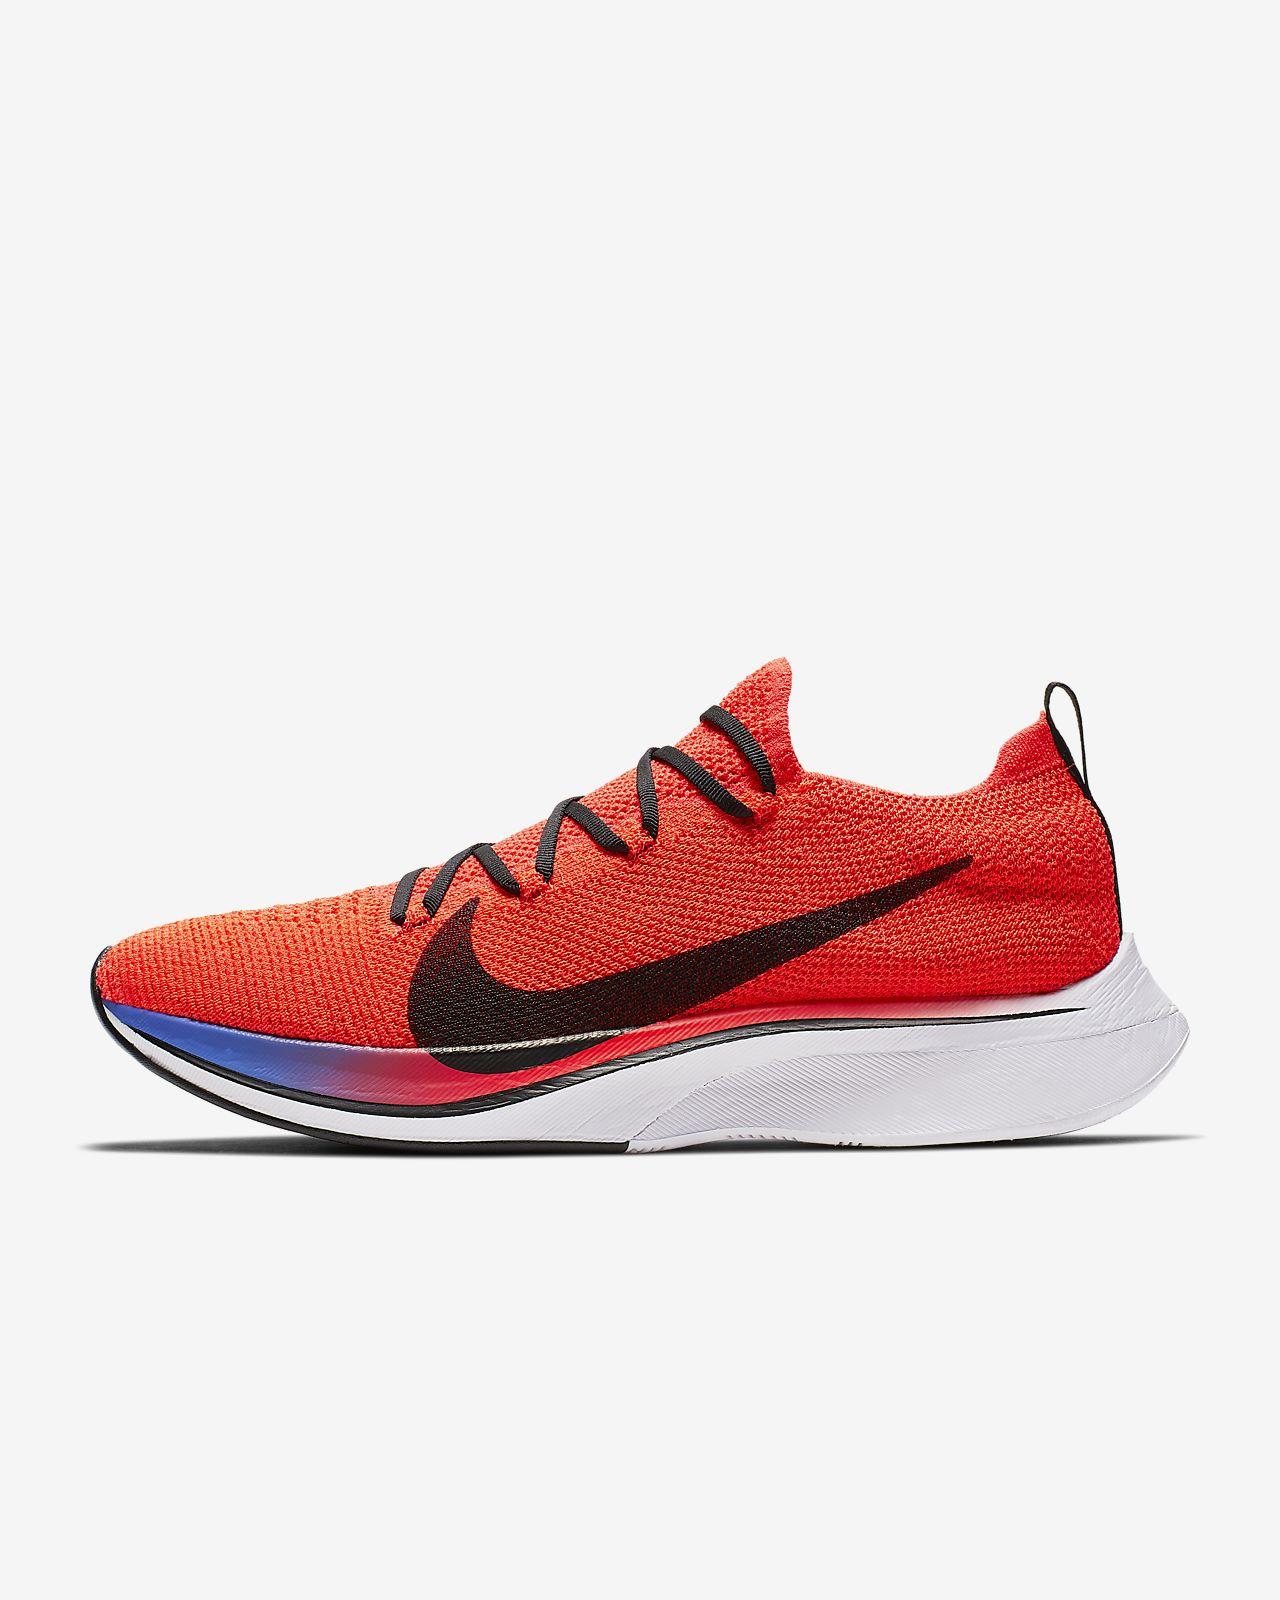 san francisco 72a33 90470 ... Chaussure de running Nike Vaporfly 4% Flyknit